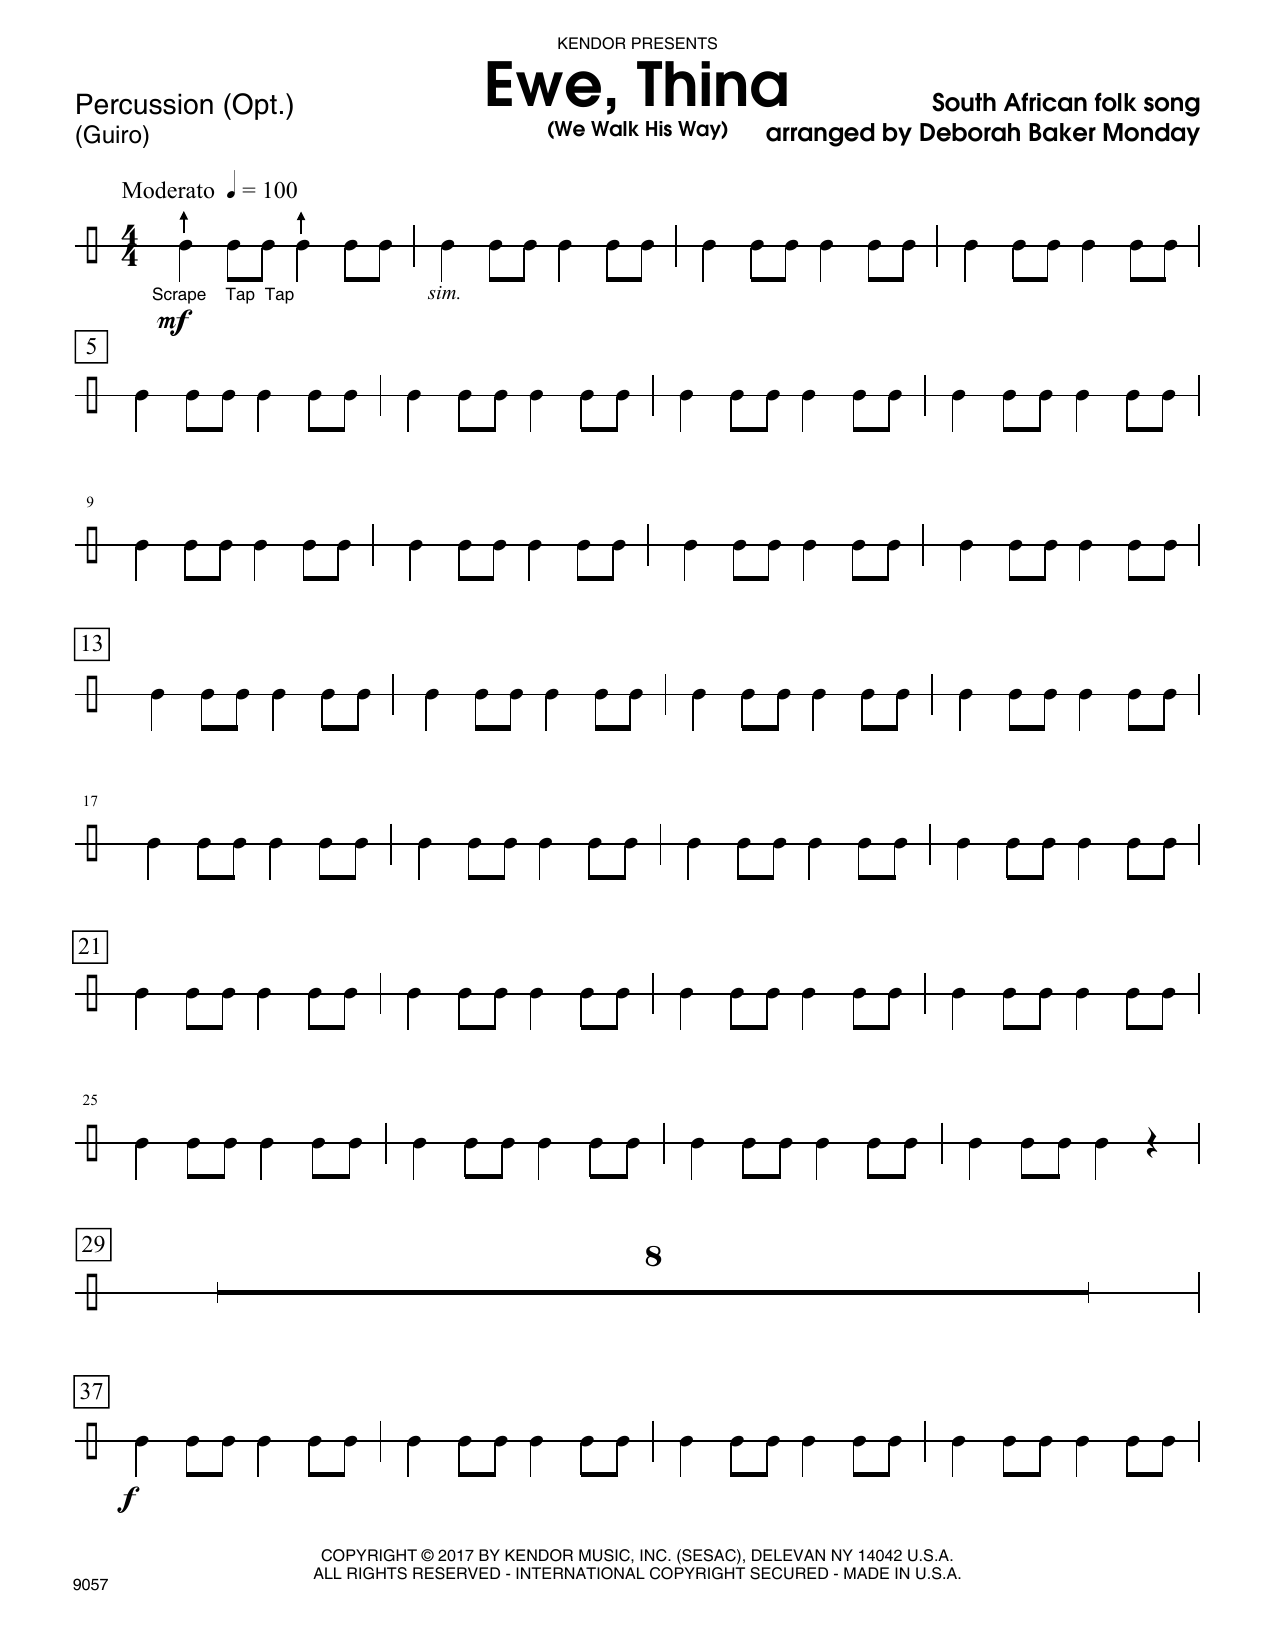 Deborah Baker Monday Ewe, Thina (We Walk His Way) - Percussion sheet music notes and chords. Download Printable PDF.